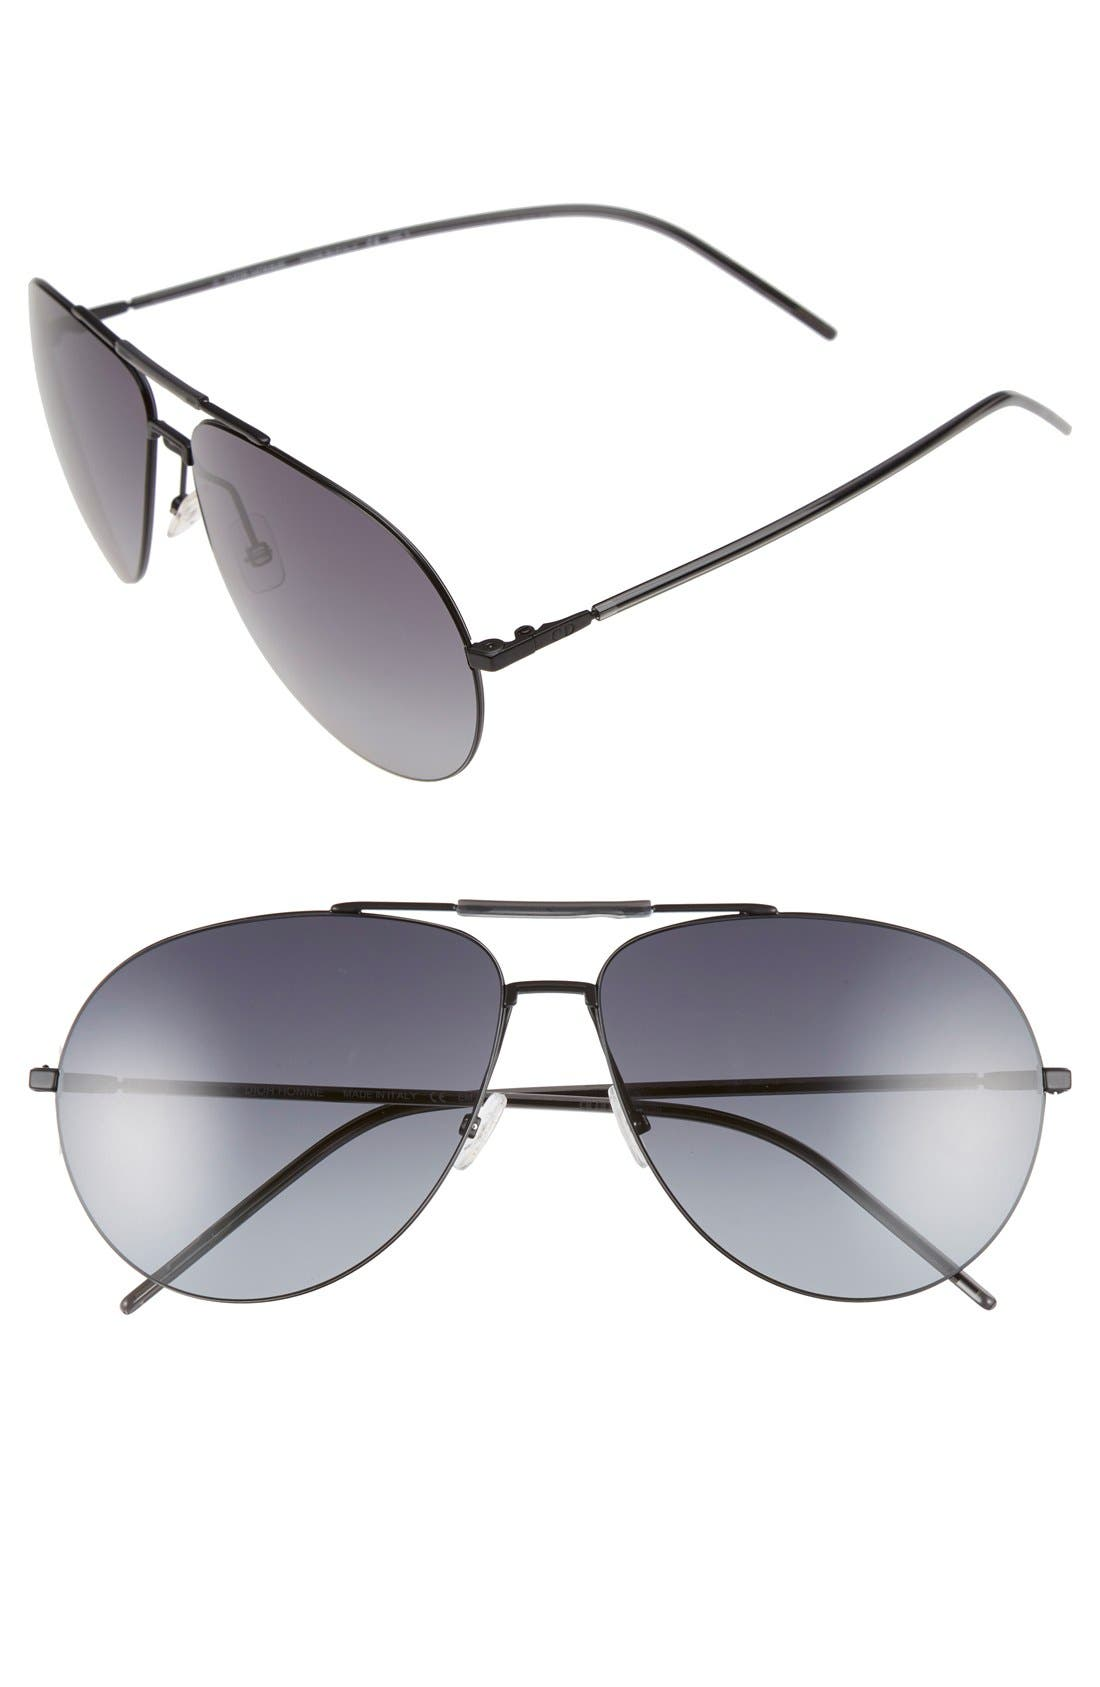 Main Image - Dior Homme 62mm Aviator Sunglasses